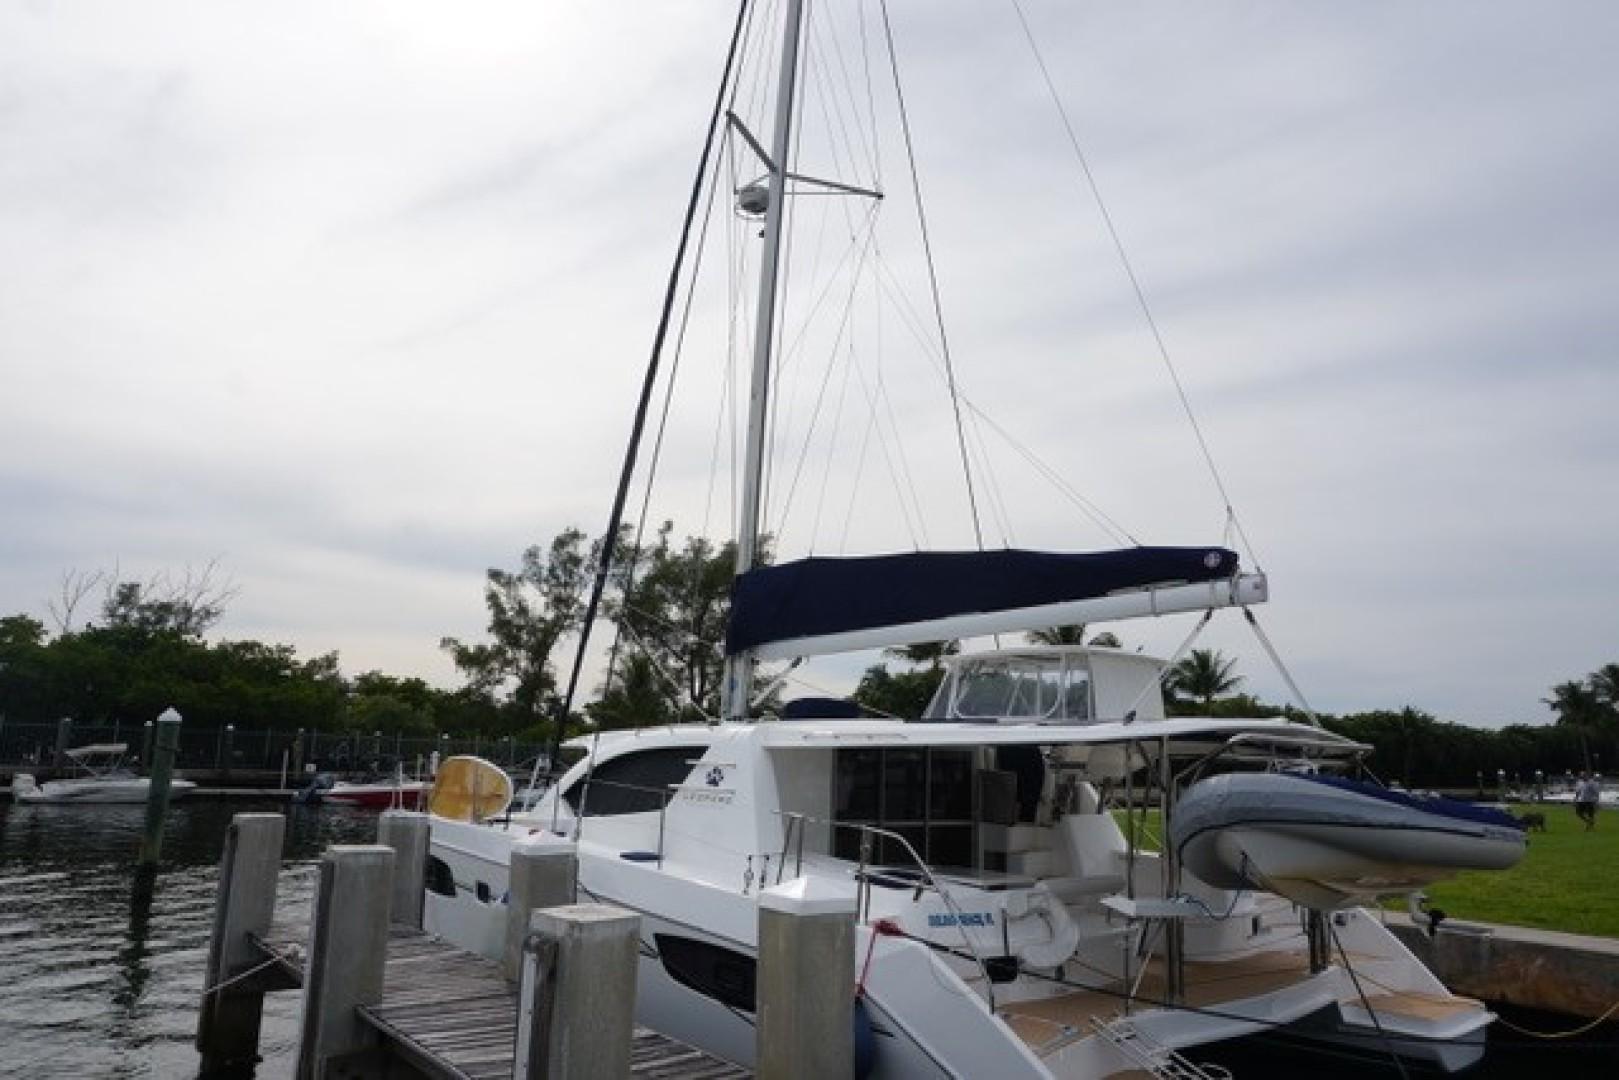 Leopard-44 2016-Grateful Fort Lauderdale-Florida-United States-Port Stern View, Mast, Rigging-1471257 | Thumbnail